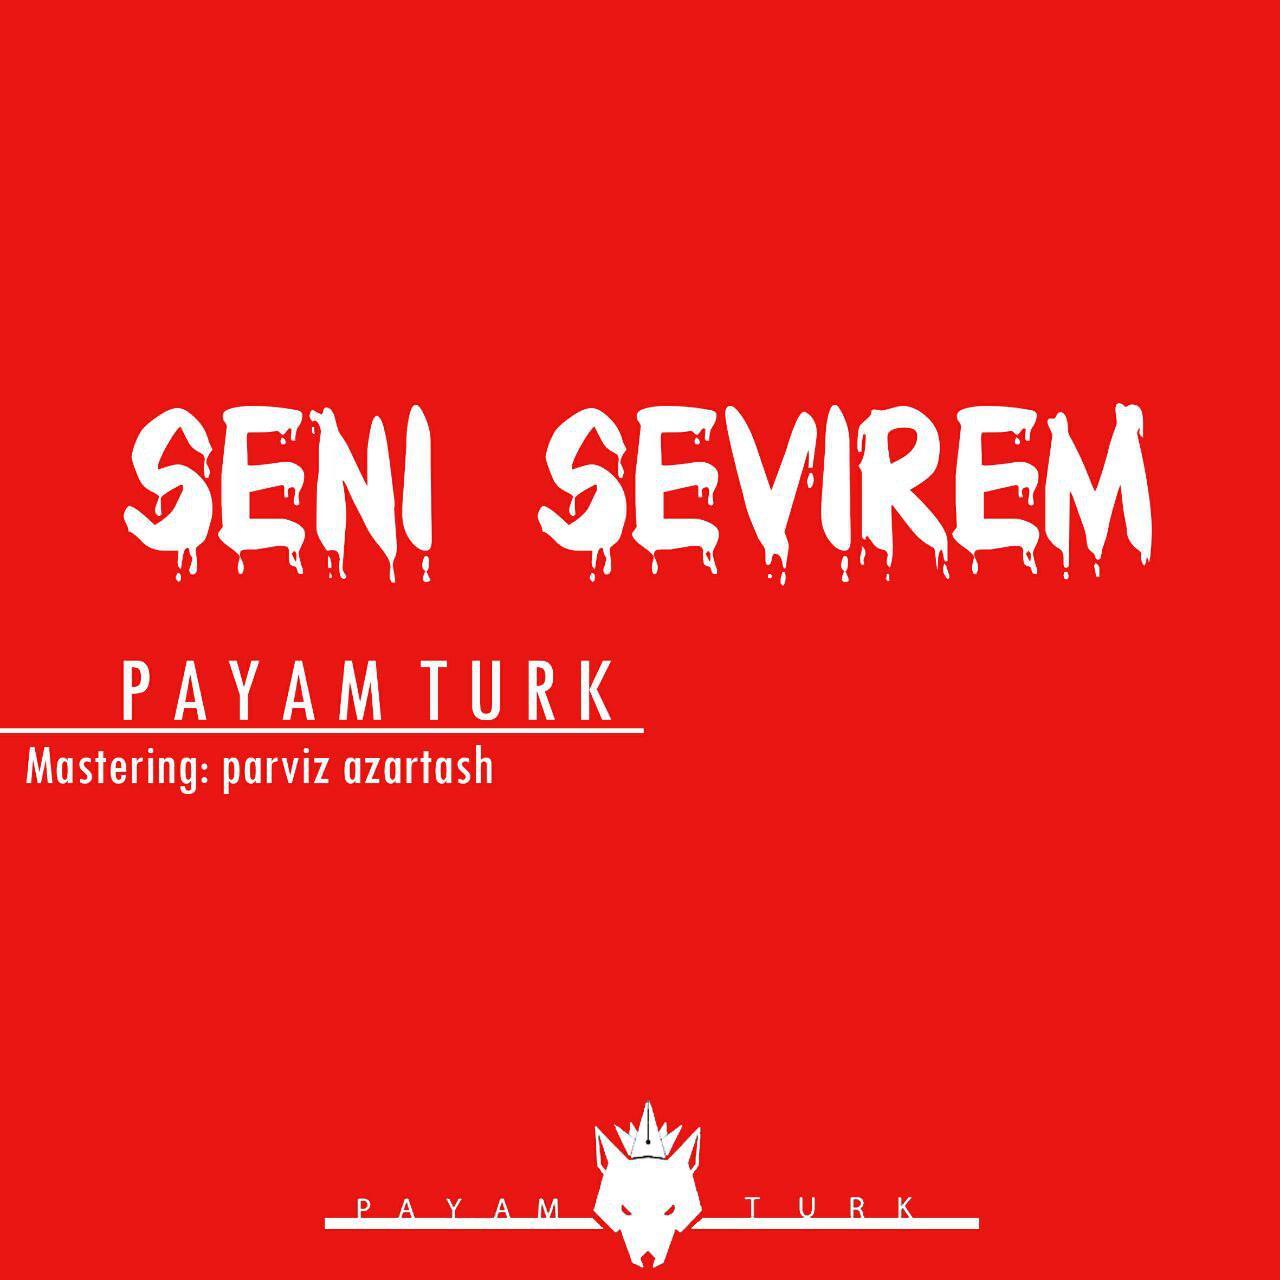 http://s8.picofile.com/file/8314134950/05Payam_Turk_Seni_Sevirem.jpg